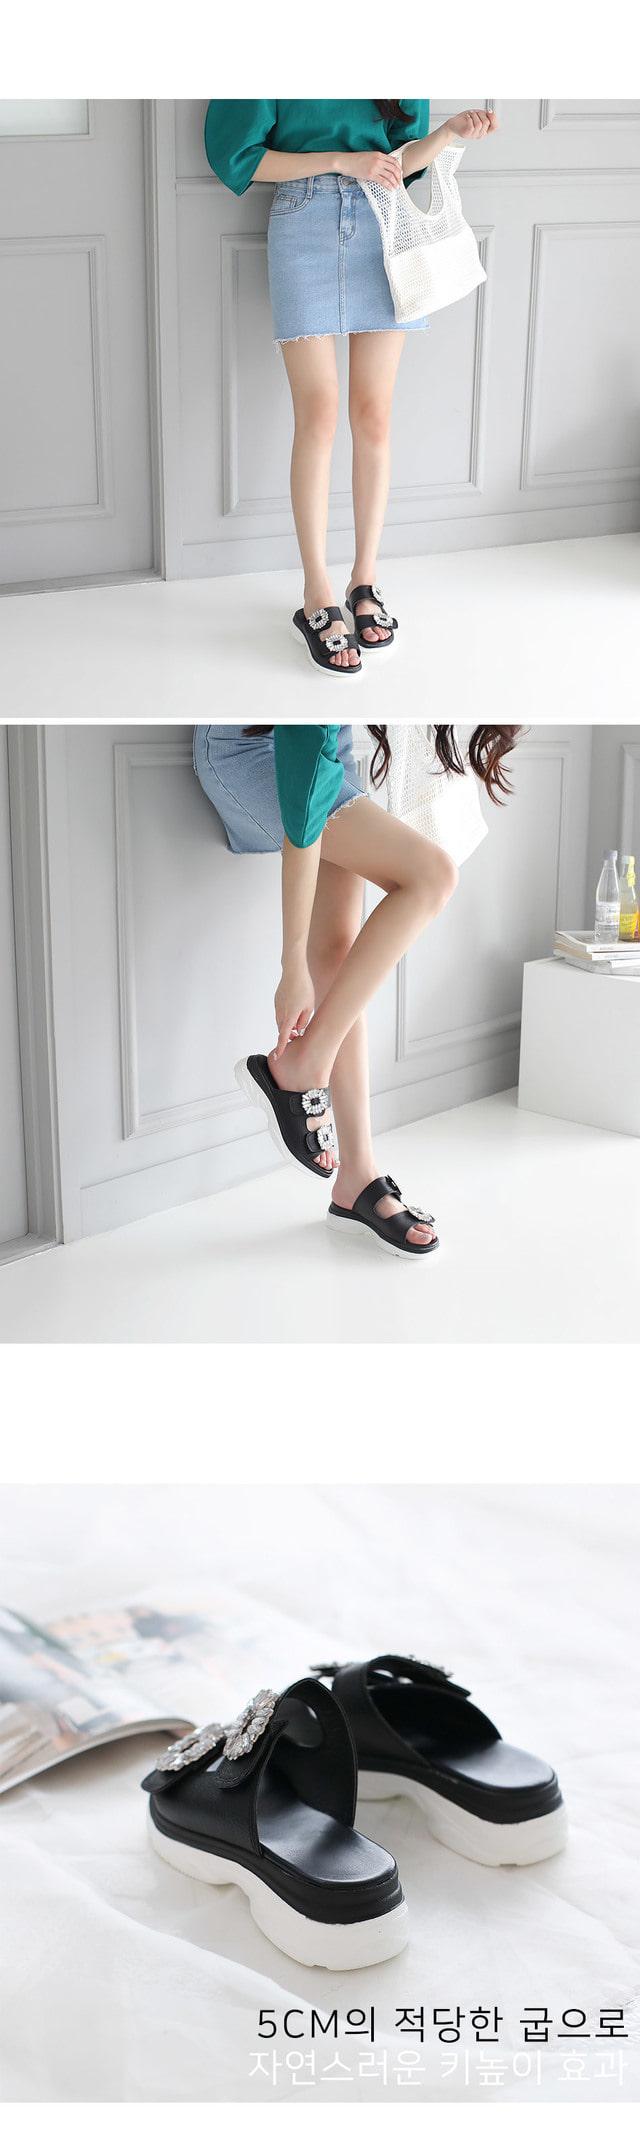 Melz Velcro Slippers 5cm